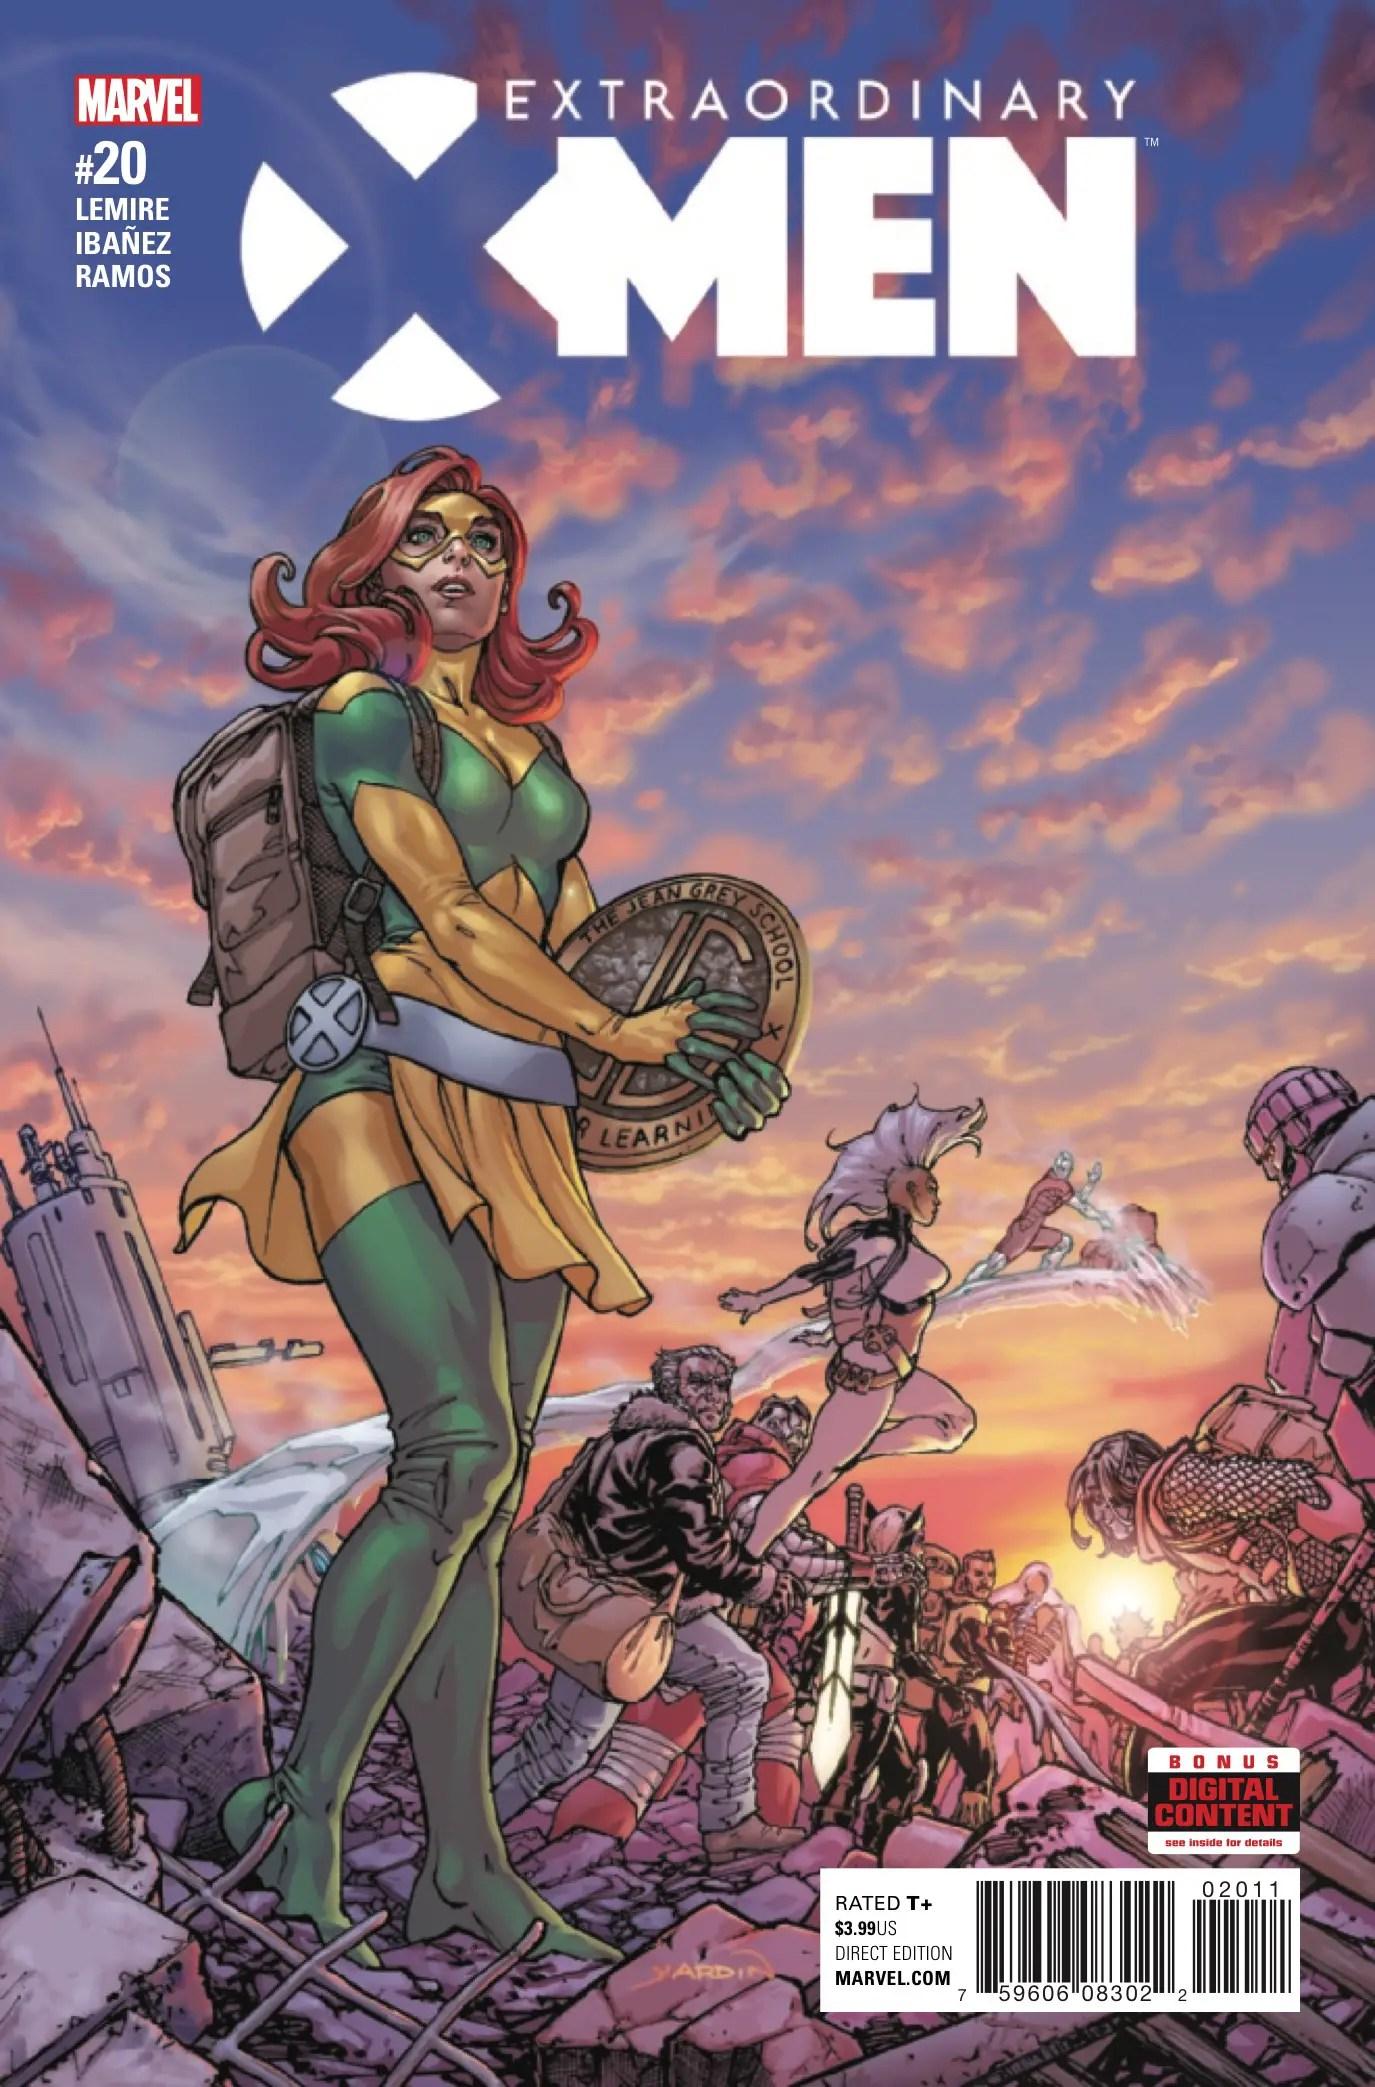 Extraordinary X-Men #20 Review